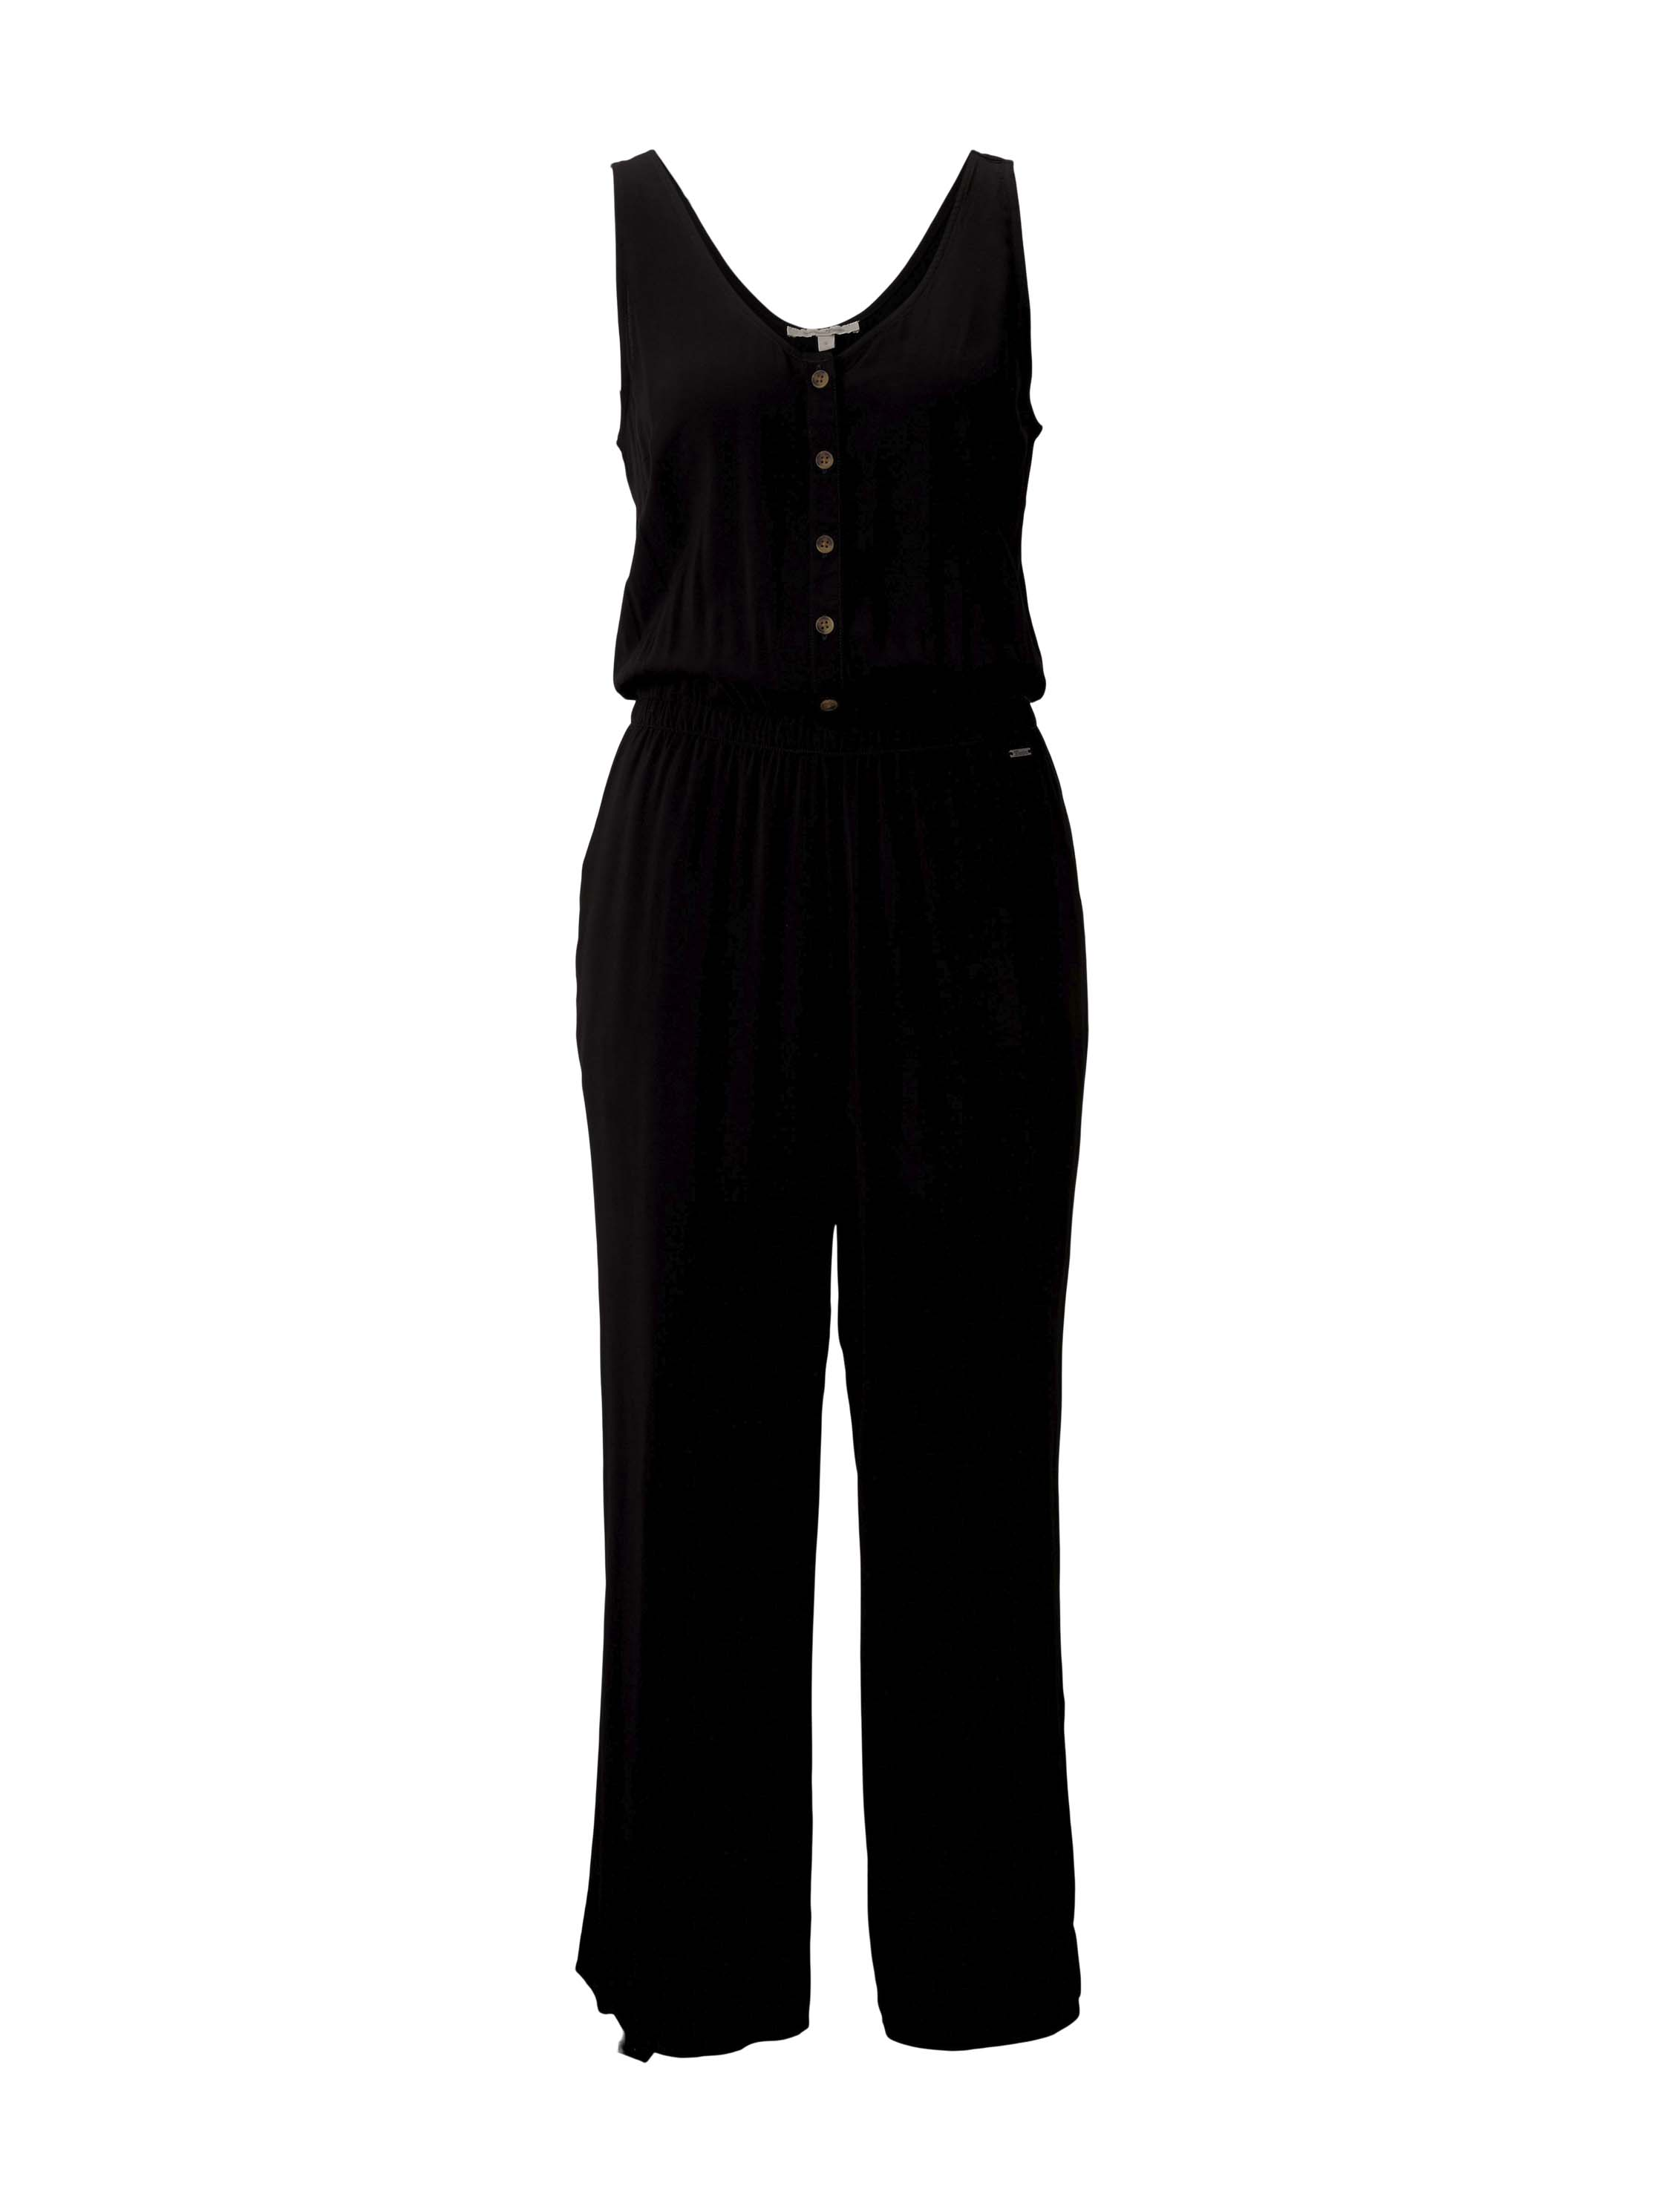 culotte overall, deep black